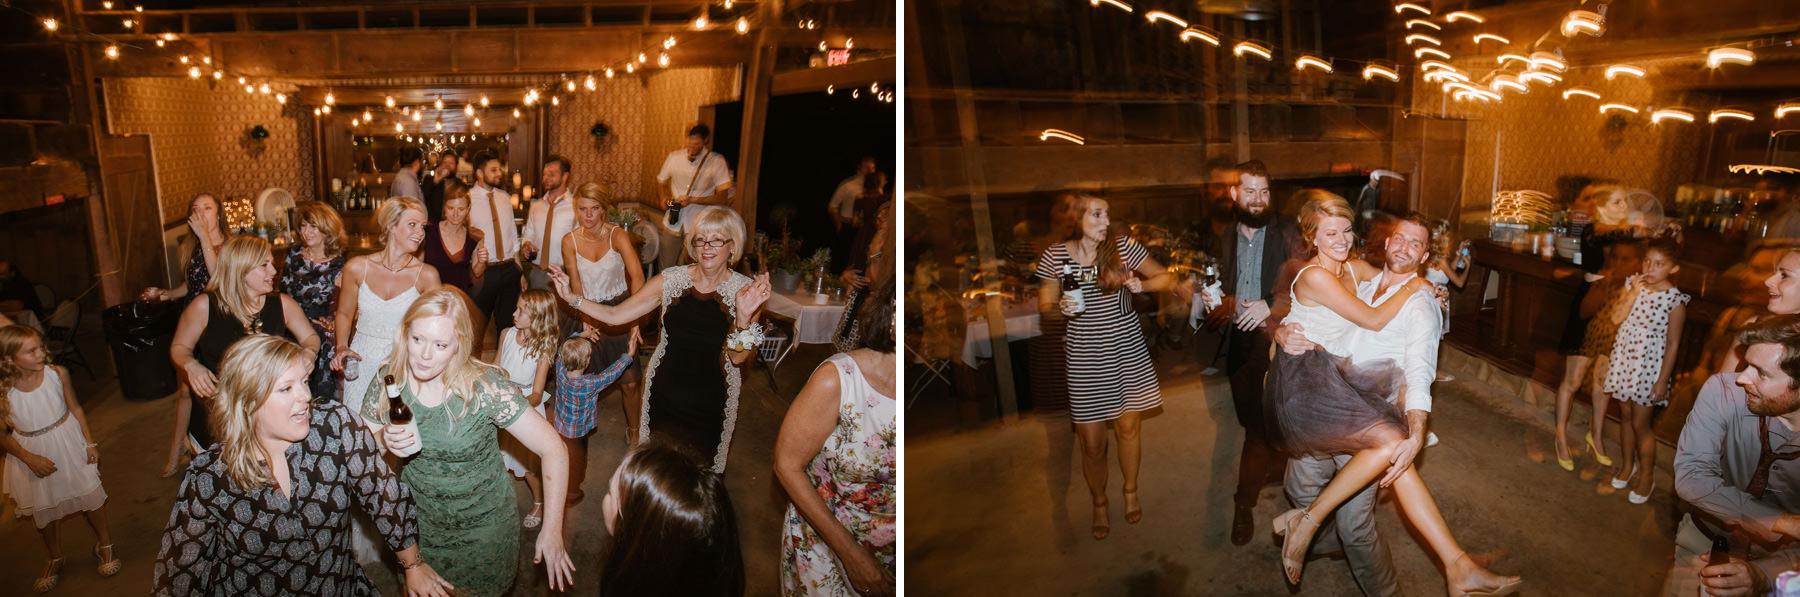 Alldredge Orchard Kansas City_Kindling Wedding Photography BLOG 87.JPG